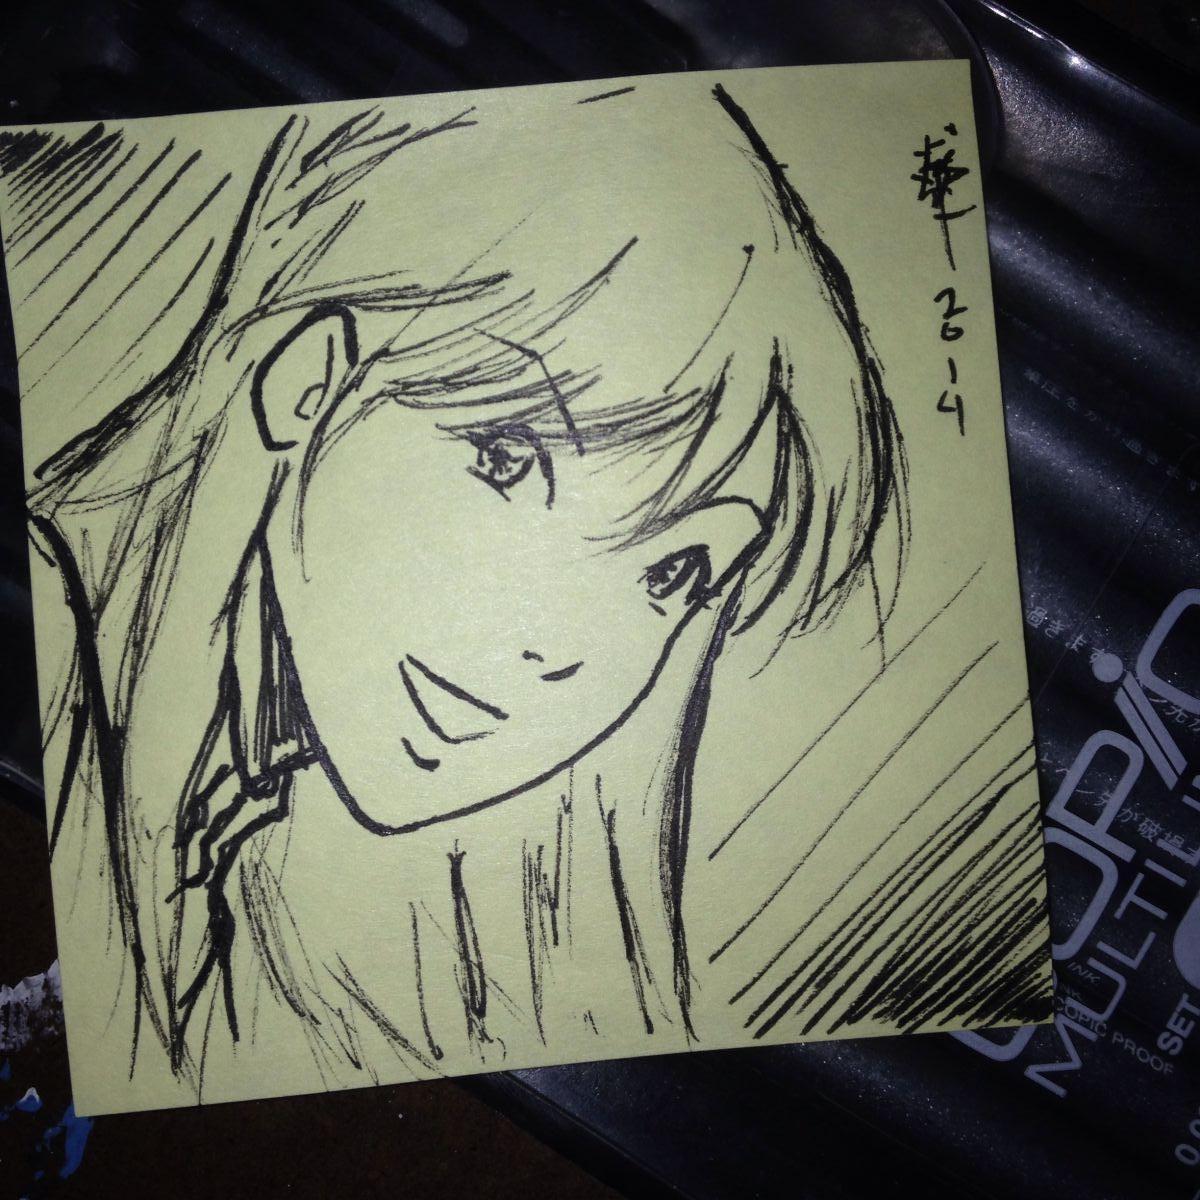 Inktober Day 5: Misa Hayase